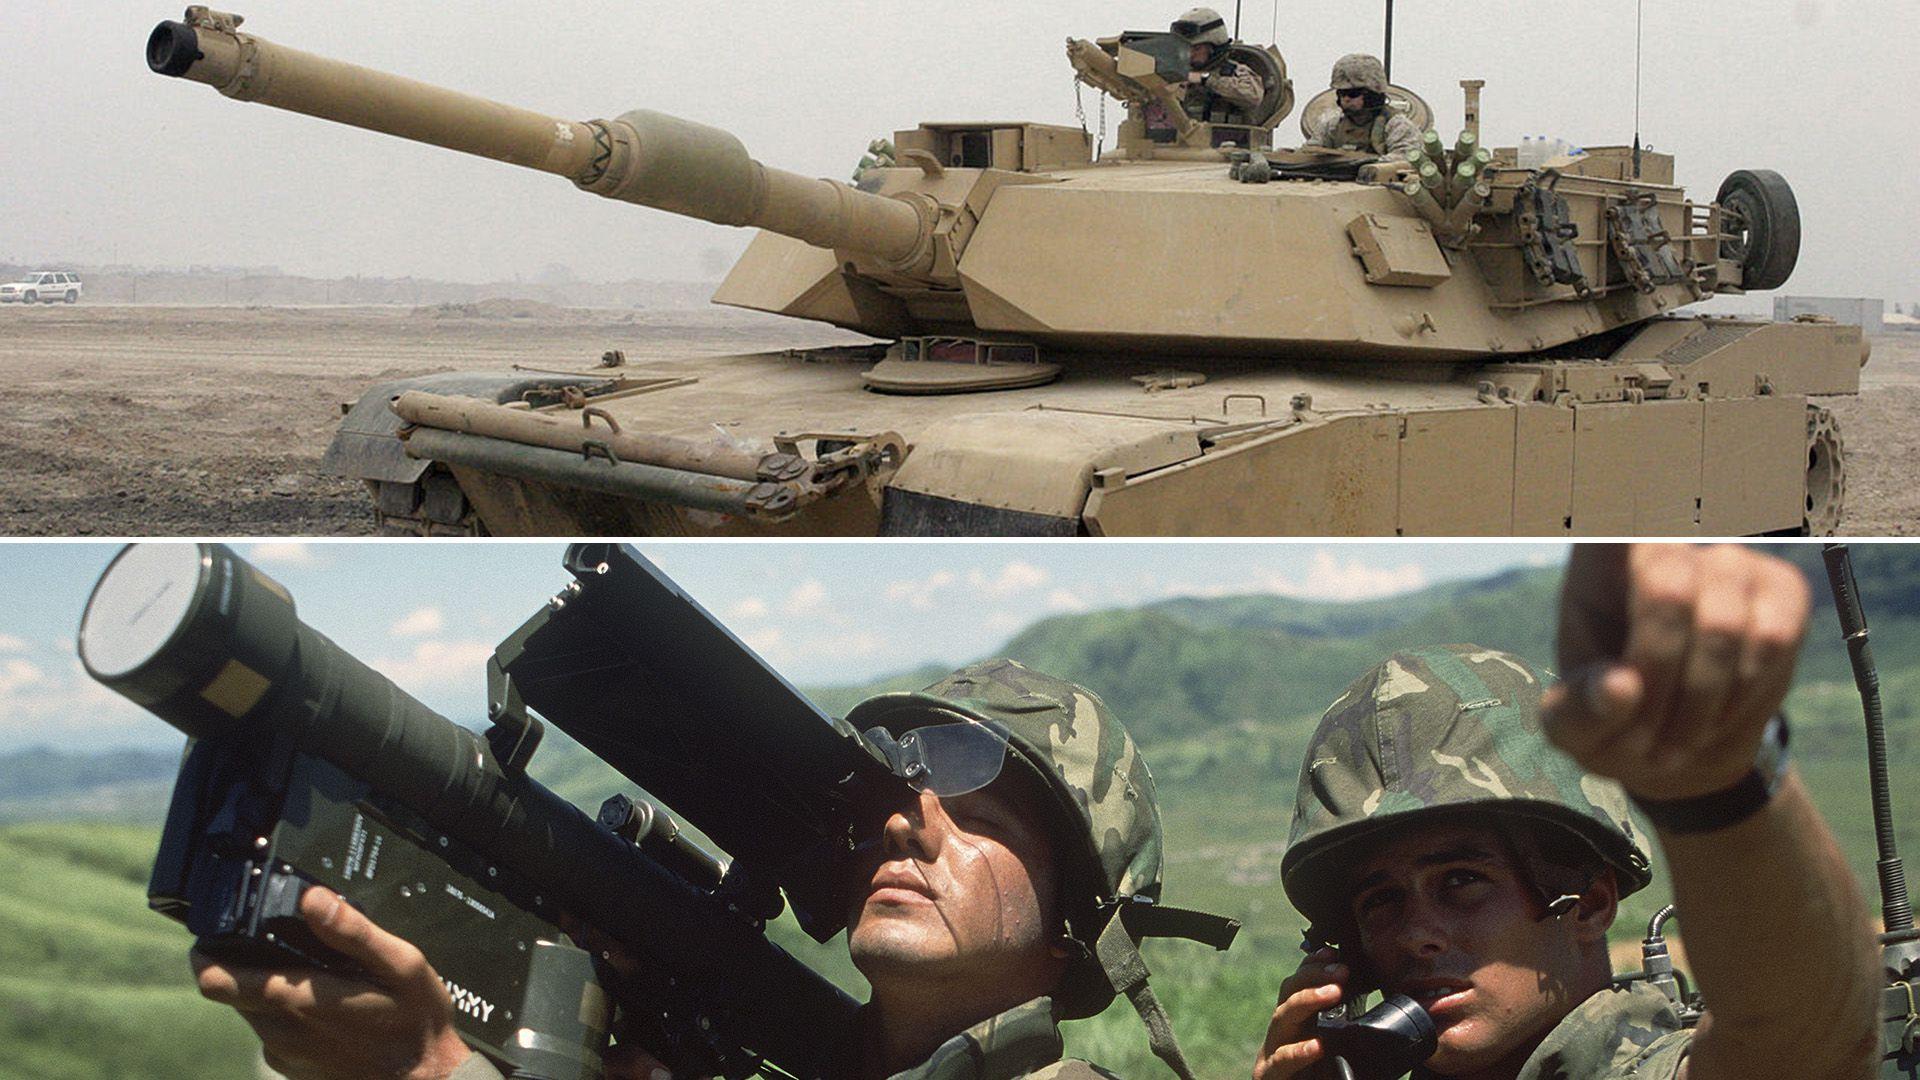 Tanques M1A2T Abrams y misiles Stinger, las armas que Estados Unidos espera poder vender a Taiwán, pese a la ira de China (Wikipedia)